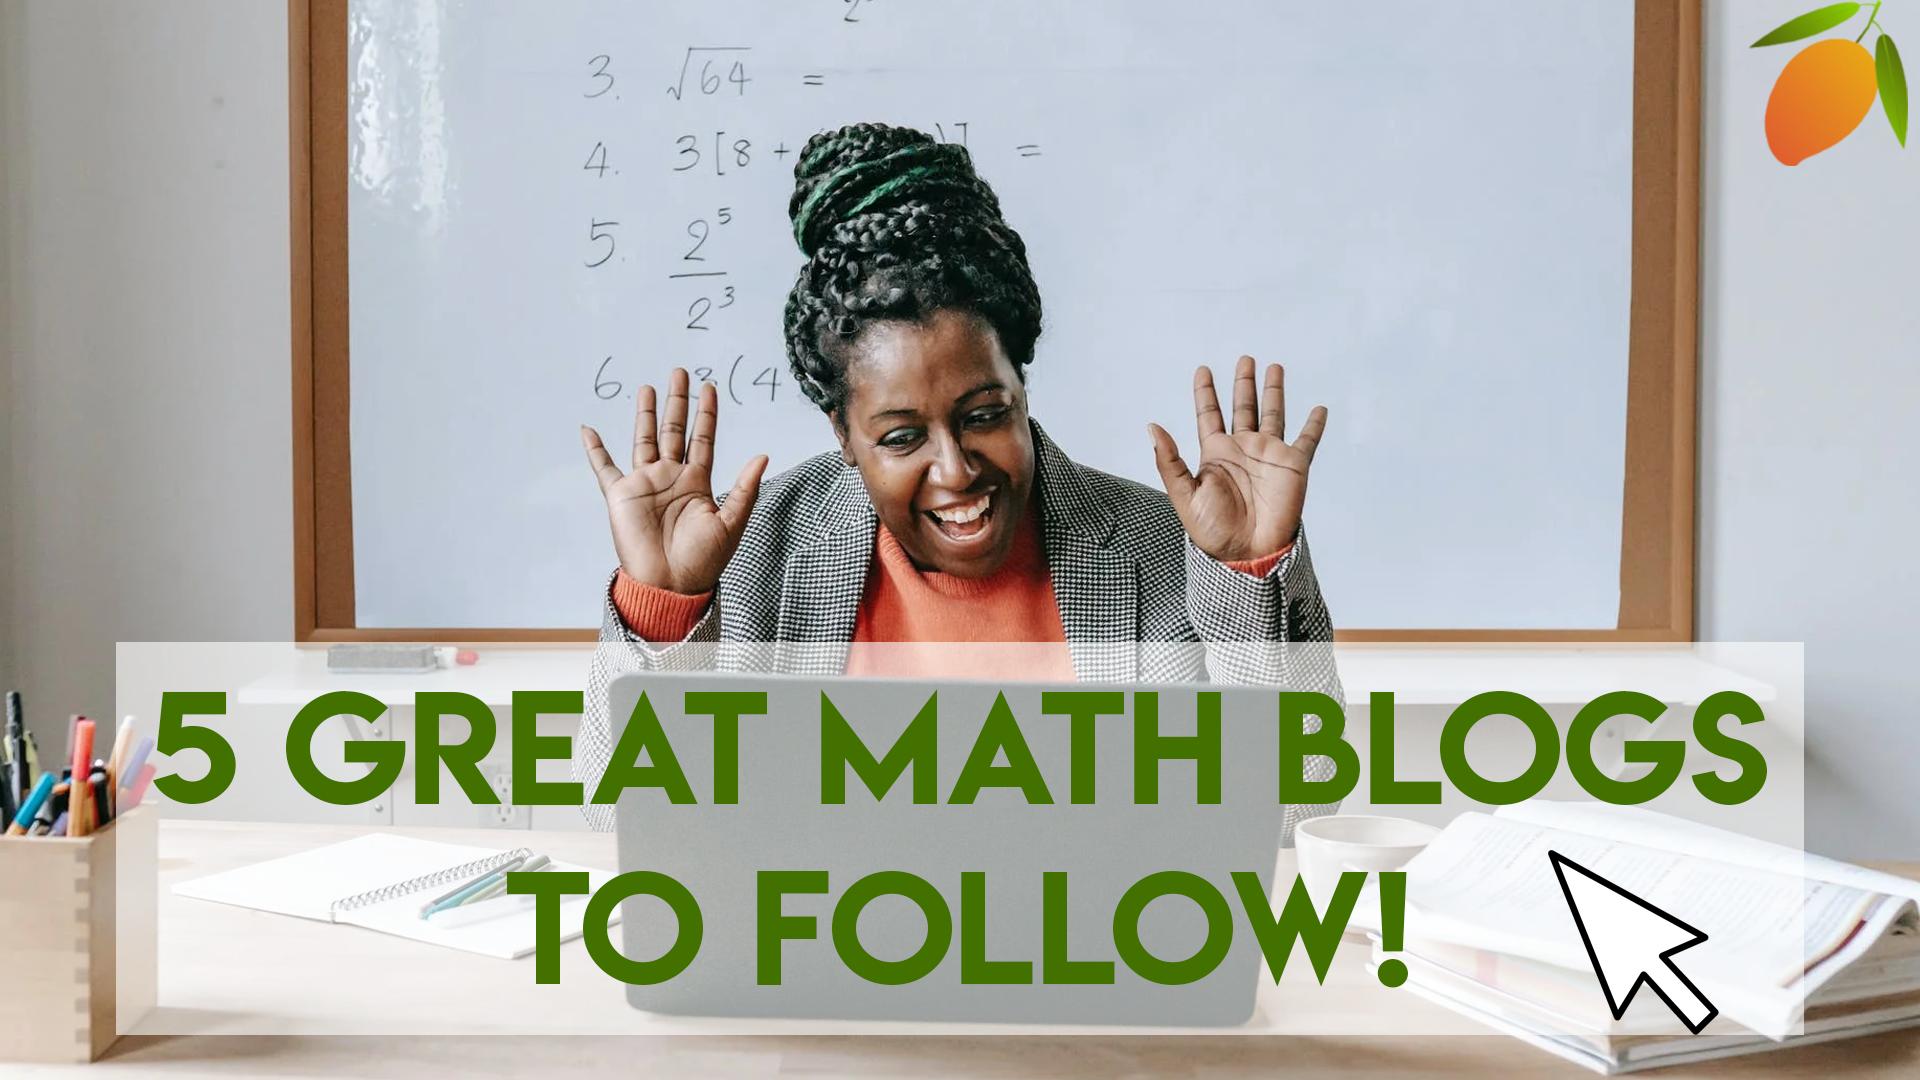 5 Great Math Blogs to Follow!